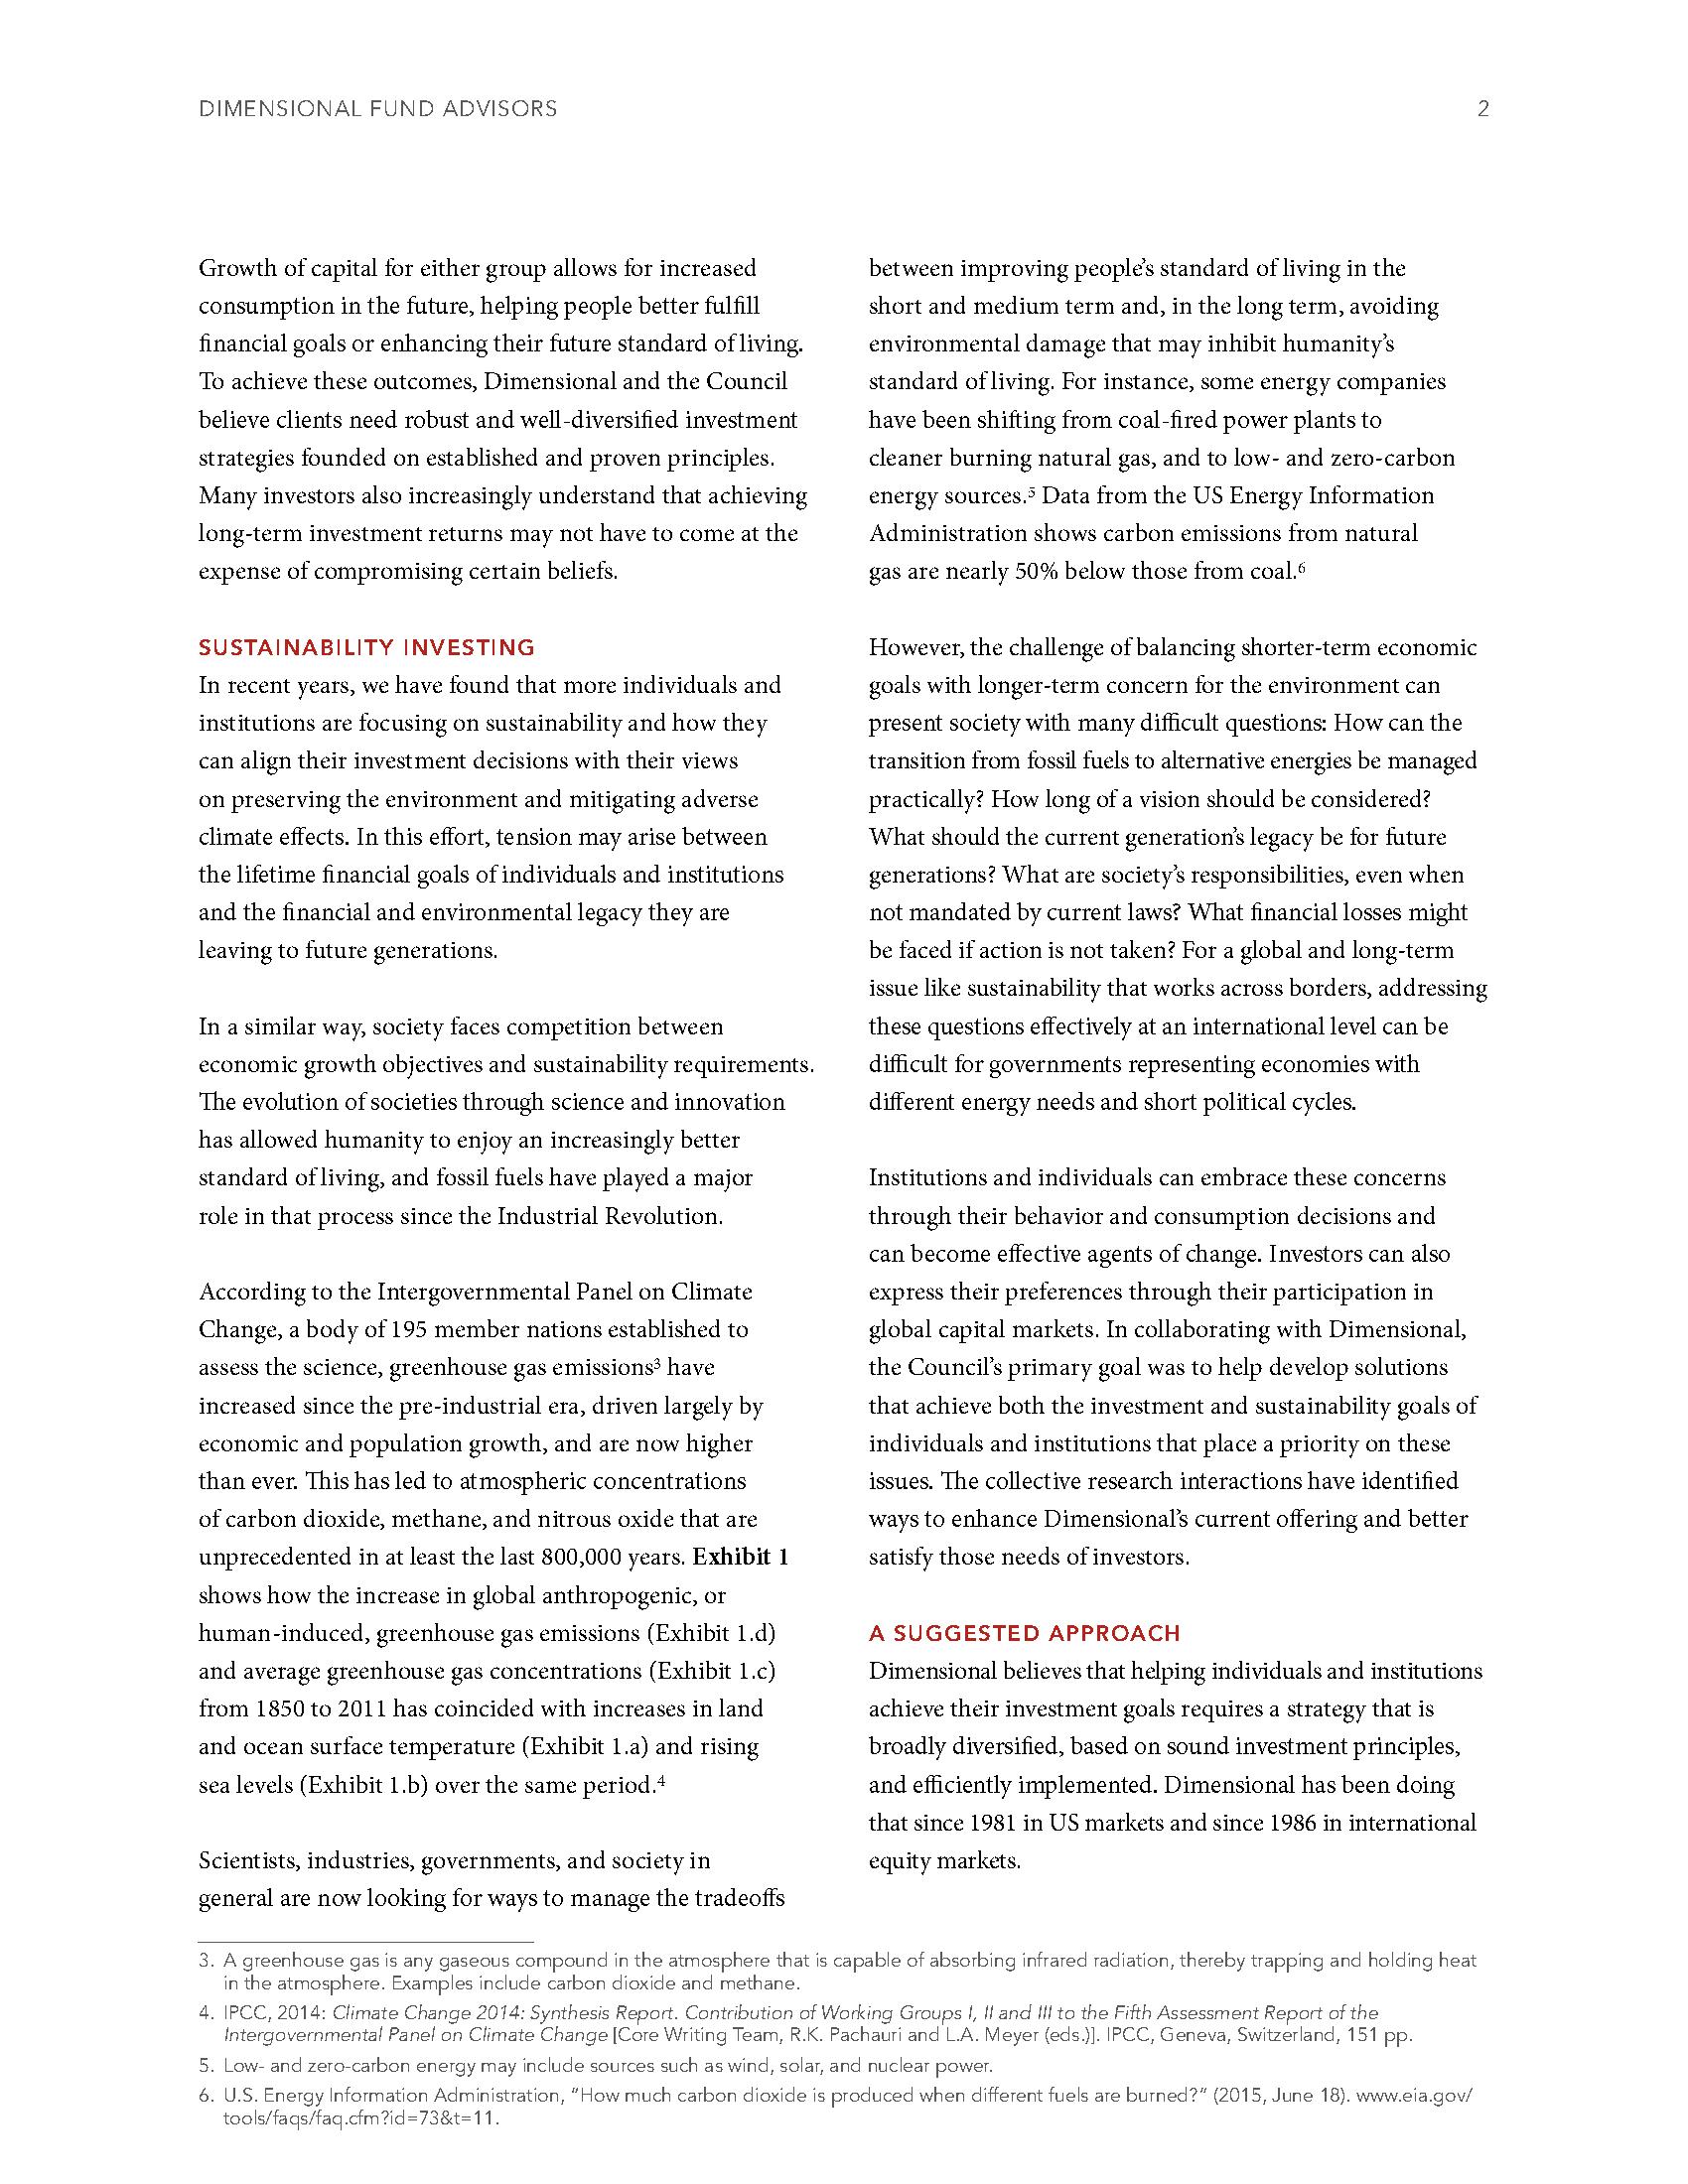 Sustainability Investing CFP DFA 2